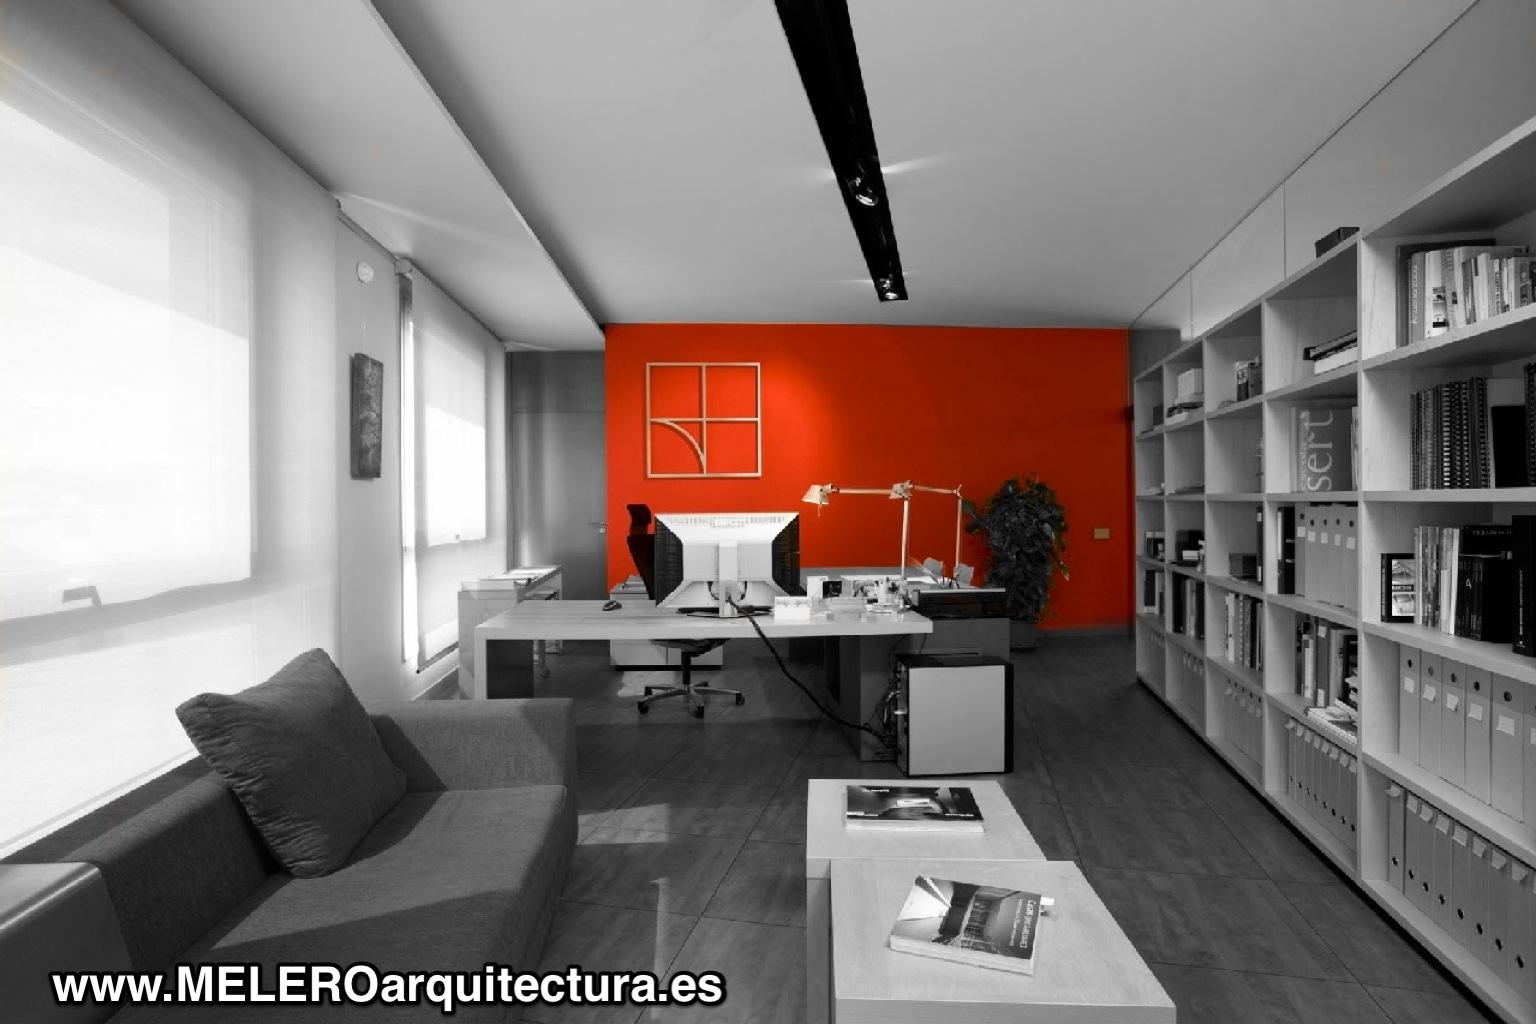 Melero arquitectura estrenamos blog del despacho melero for Despacho arquitectura